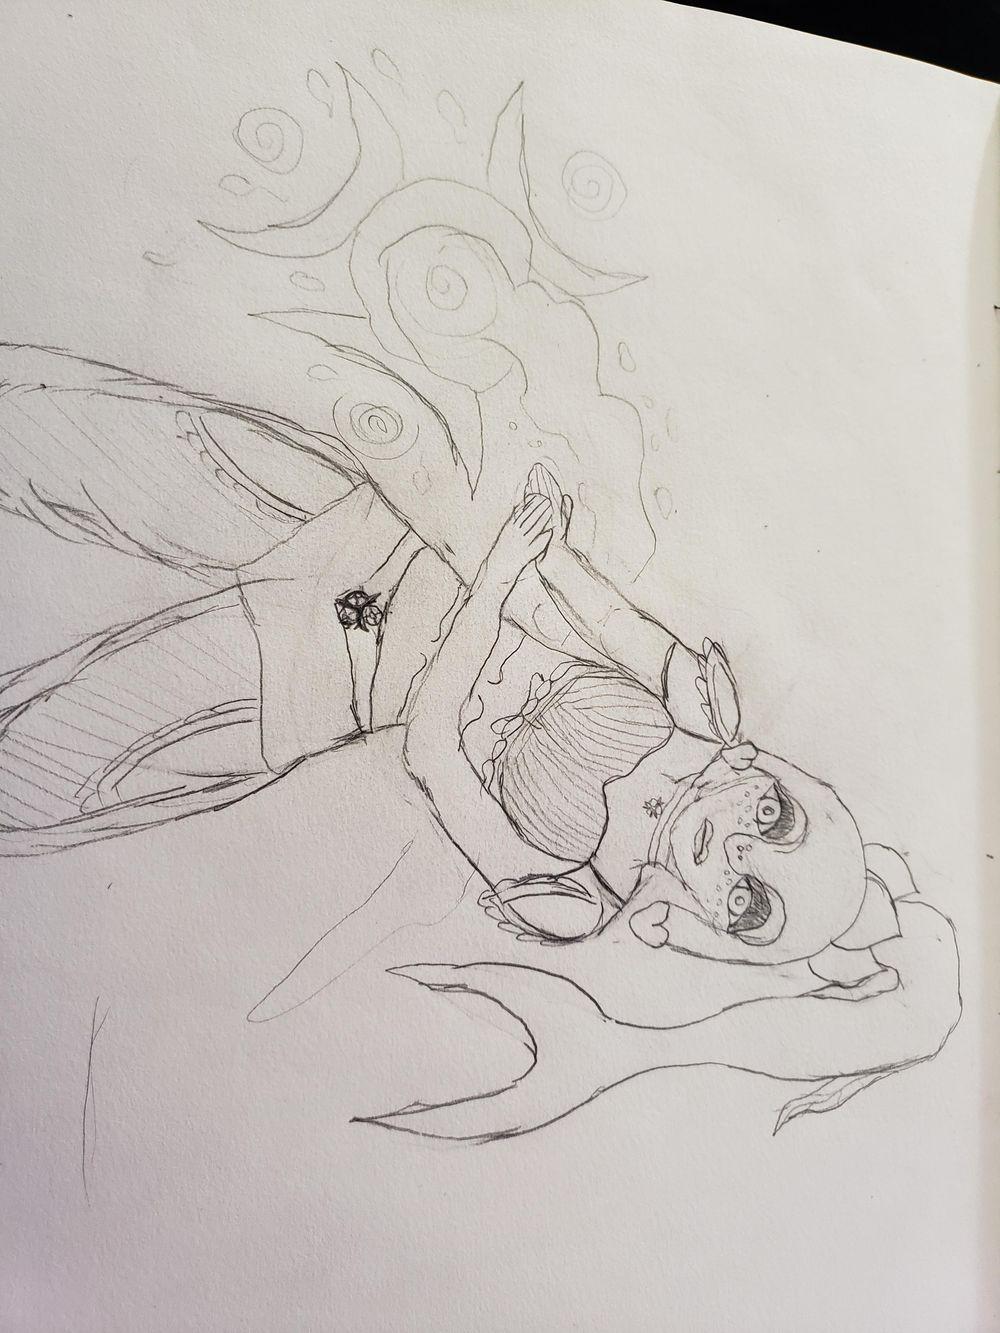 Zora Princess - image 4 - student project